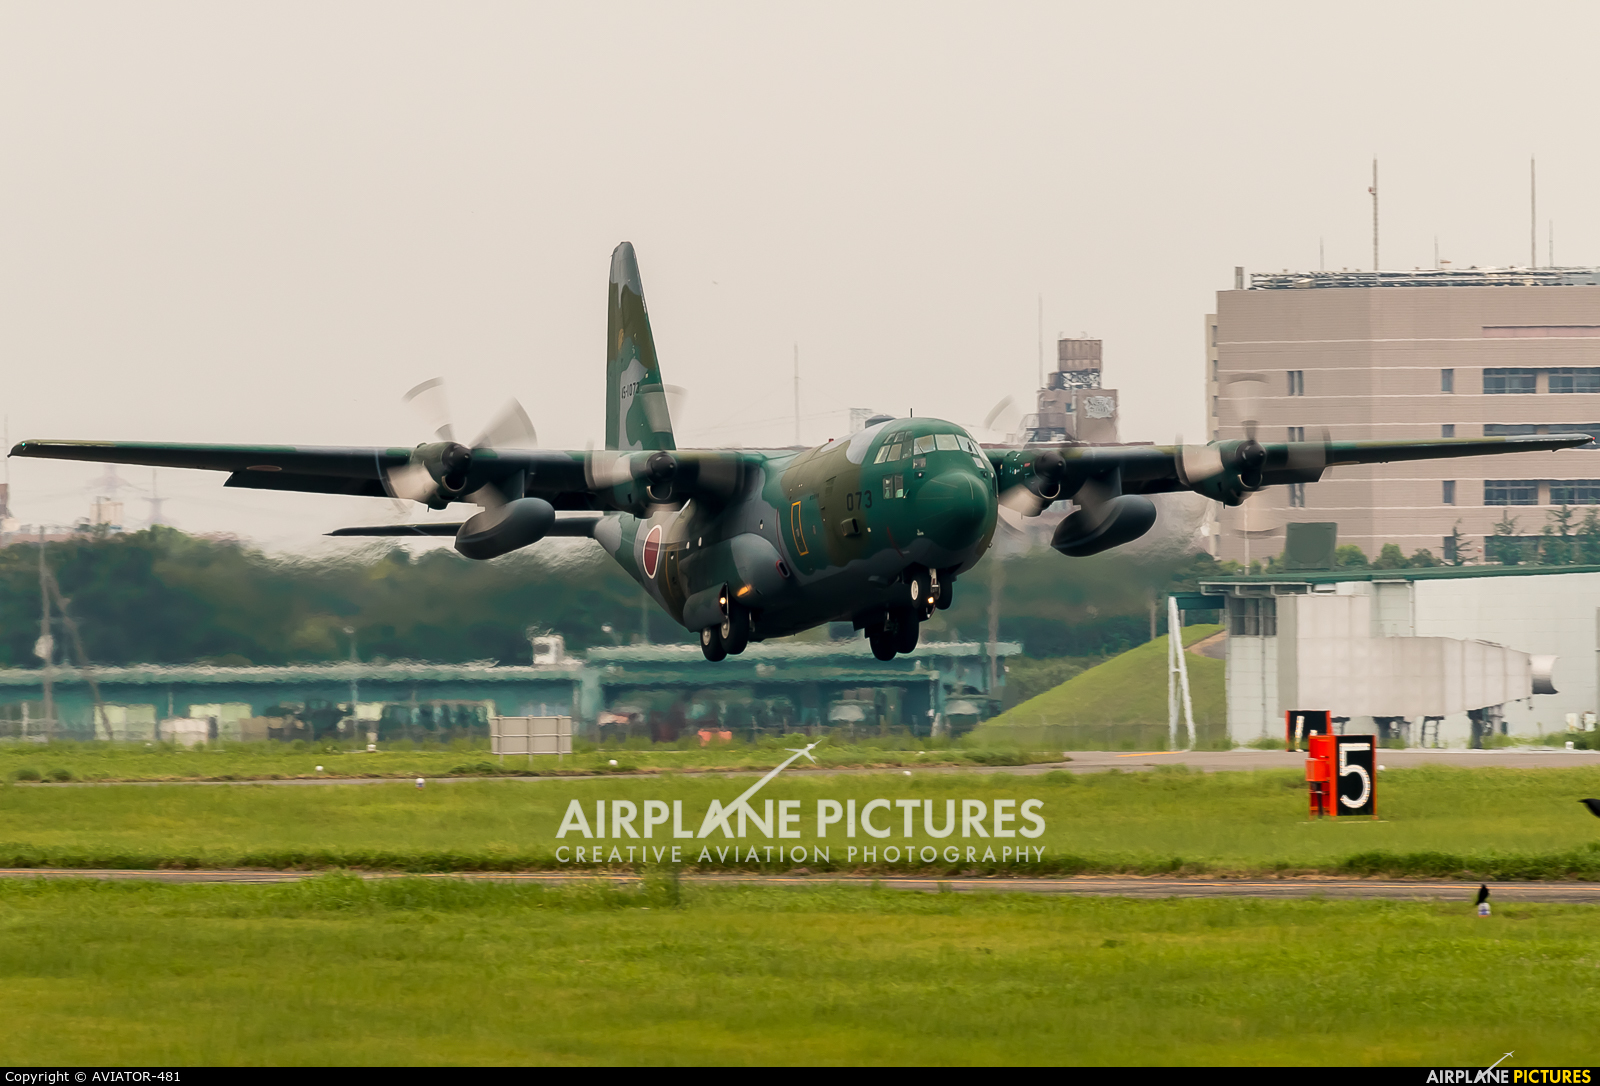 Japan - Air Self Defence Force 45-1073 aircraft at Iruma AB